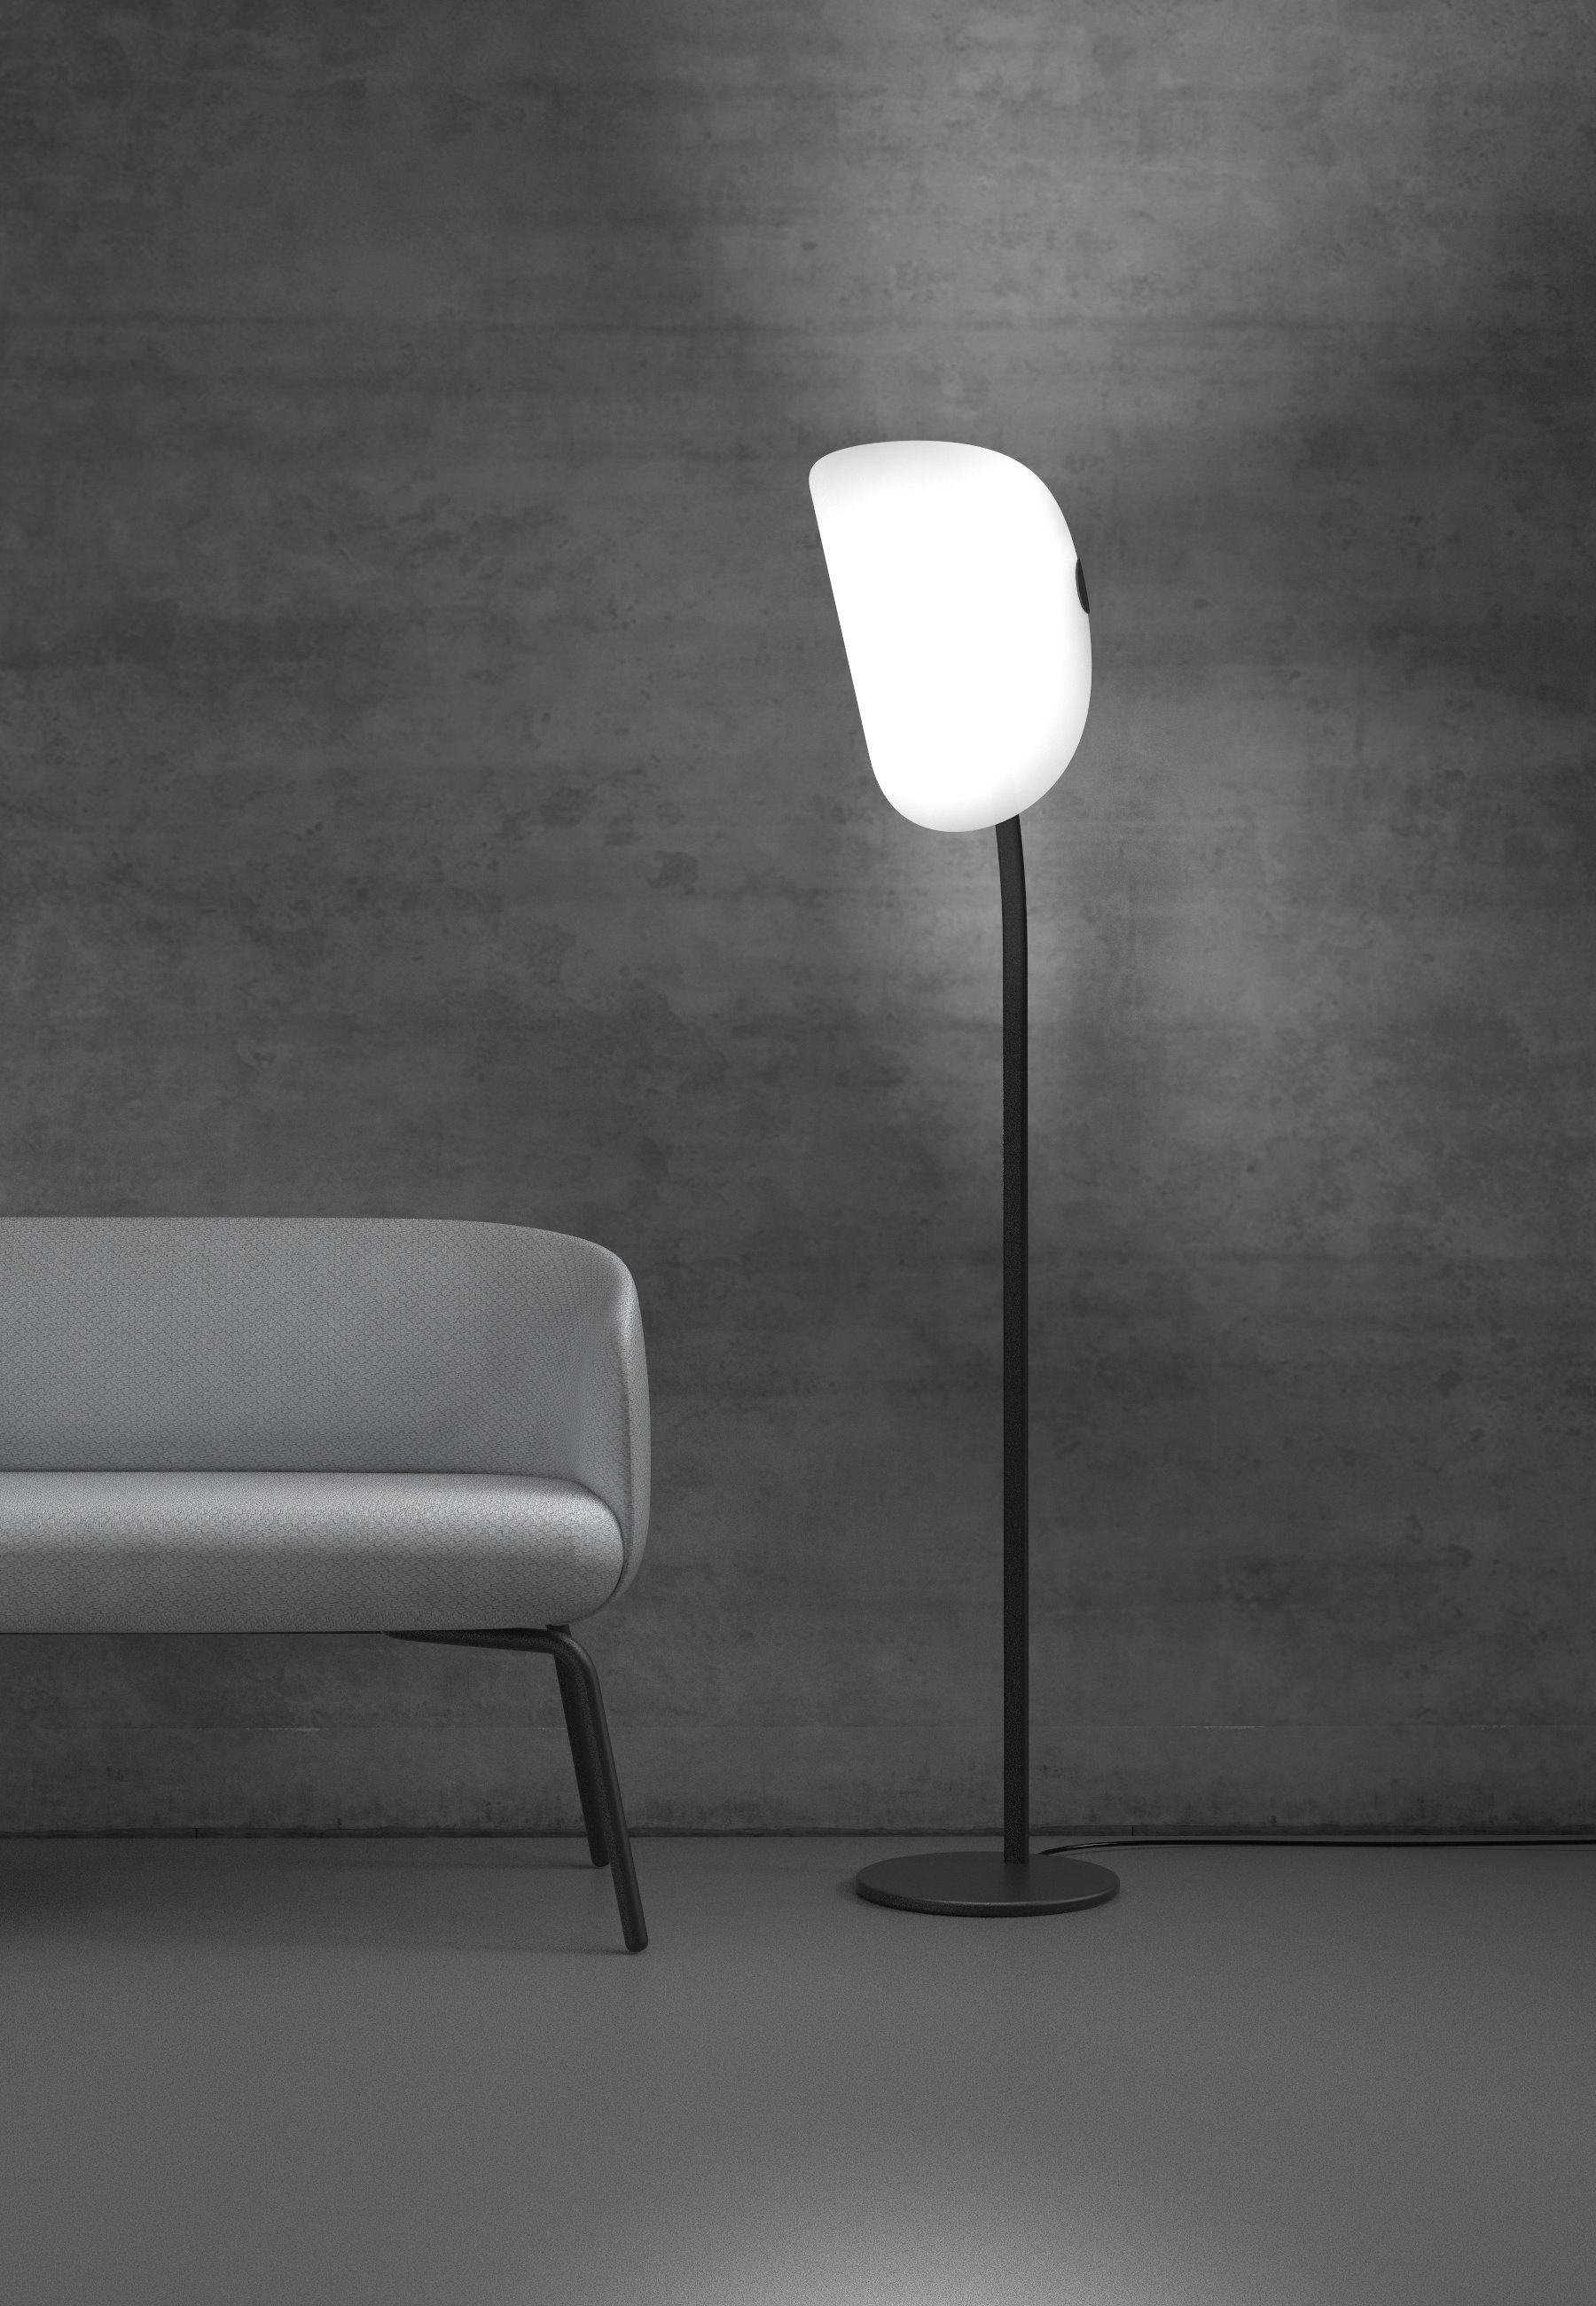 lampara pie minimalista diseño